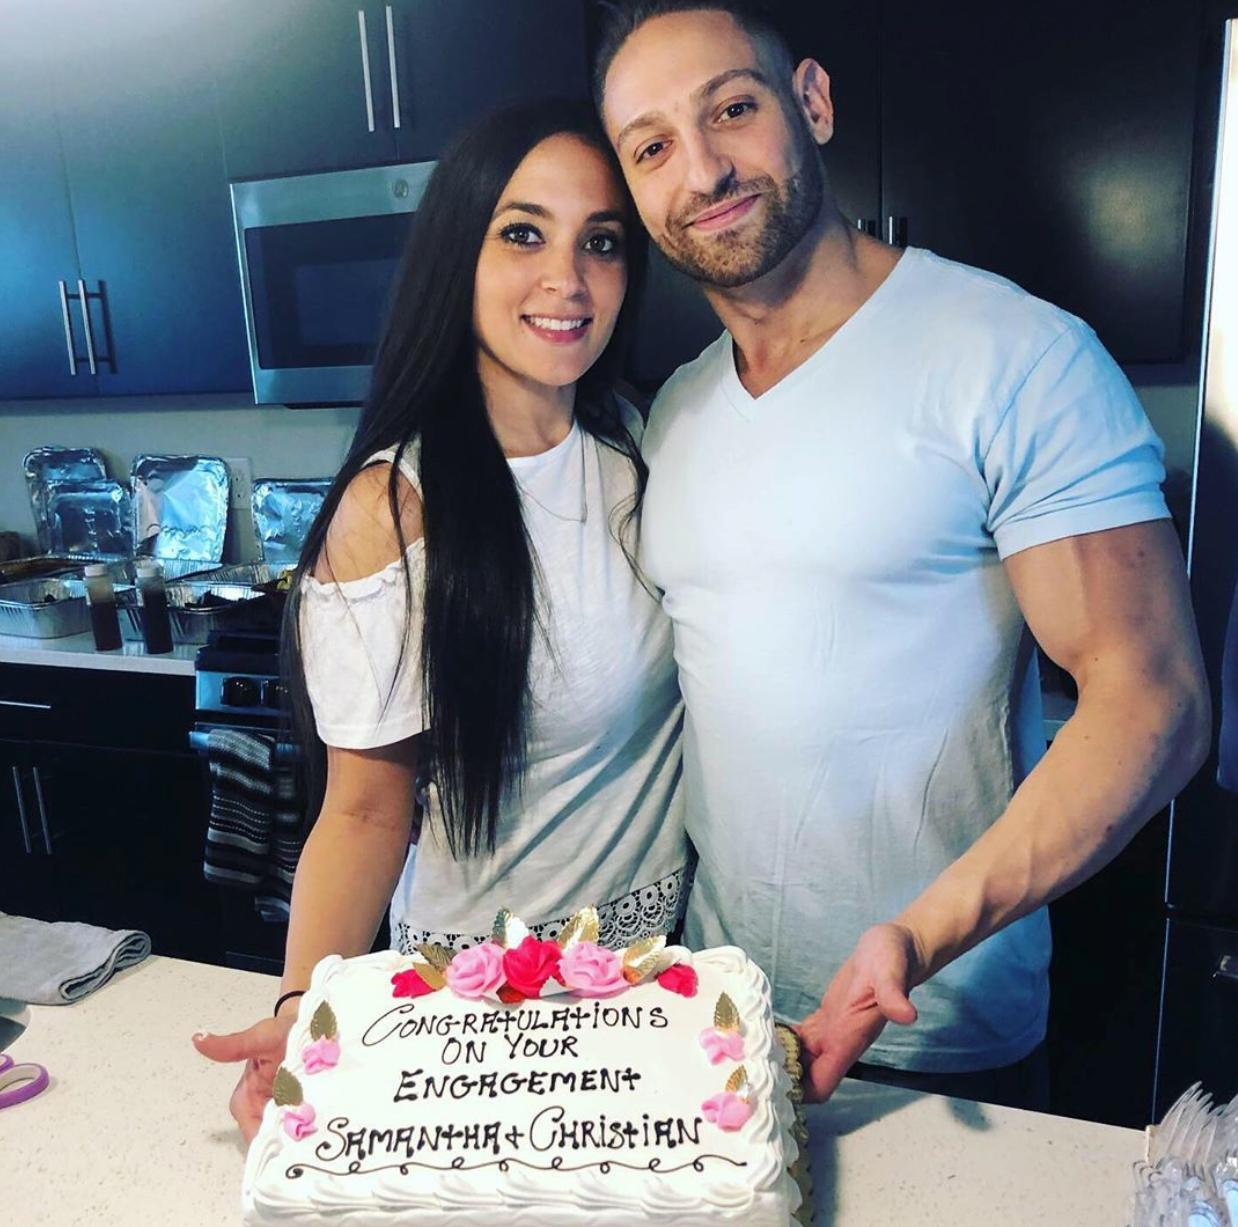 Jersey Shore's Sammi 'Sweetheart' Celebrates Engagement: Photos